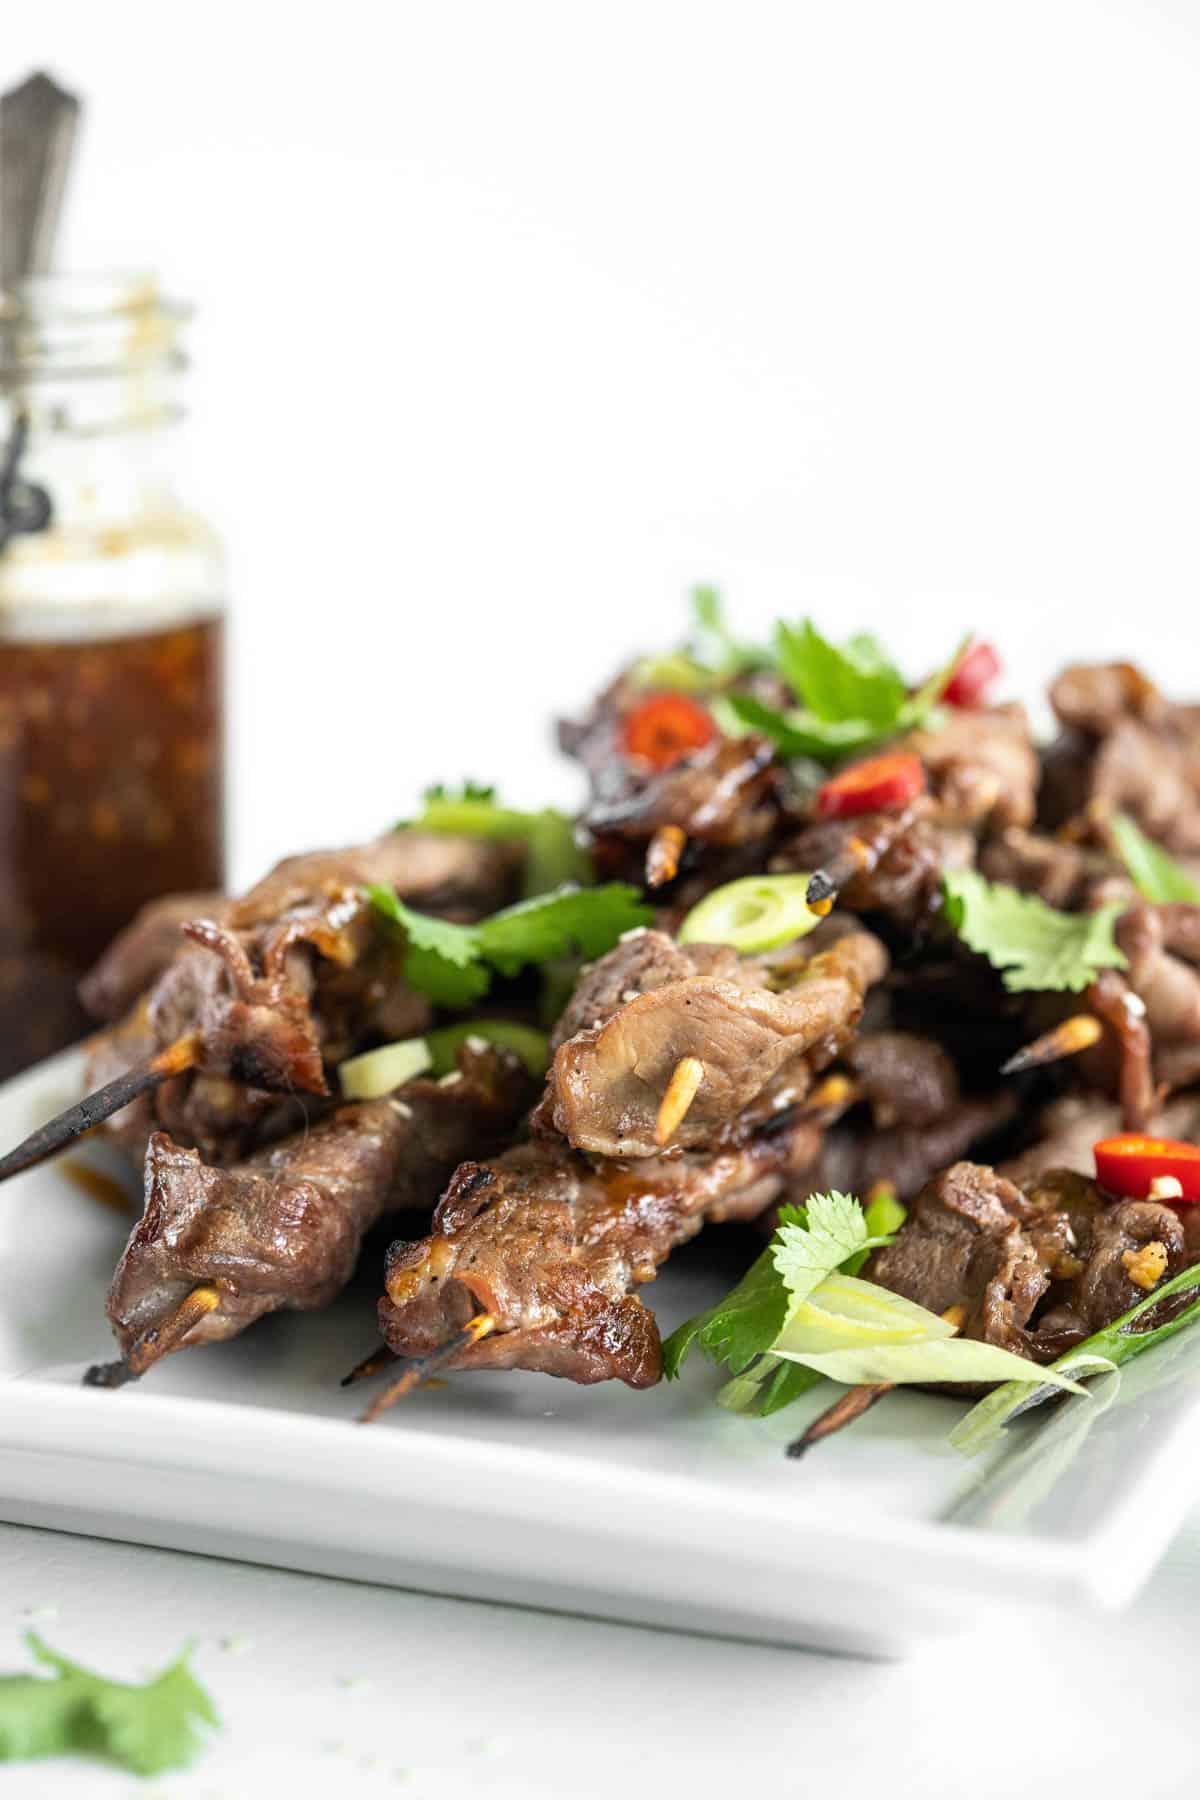 white platter of grilled steak skewers with teriyaki sauce